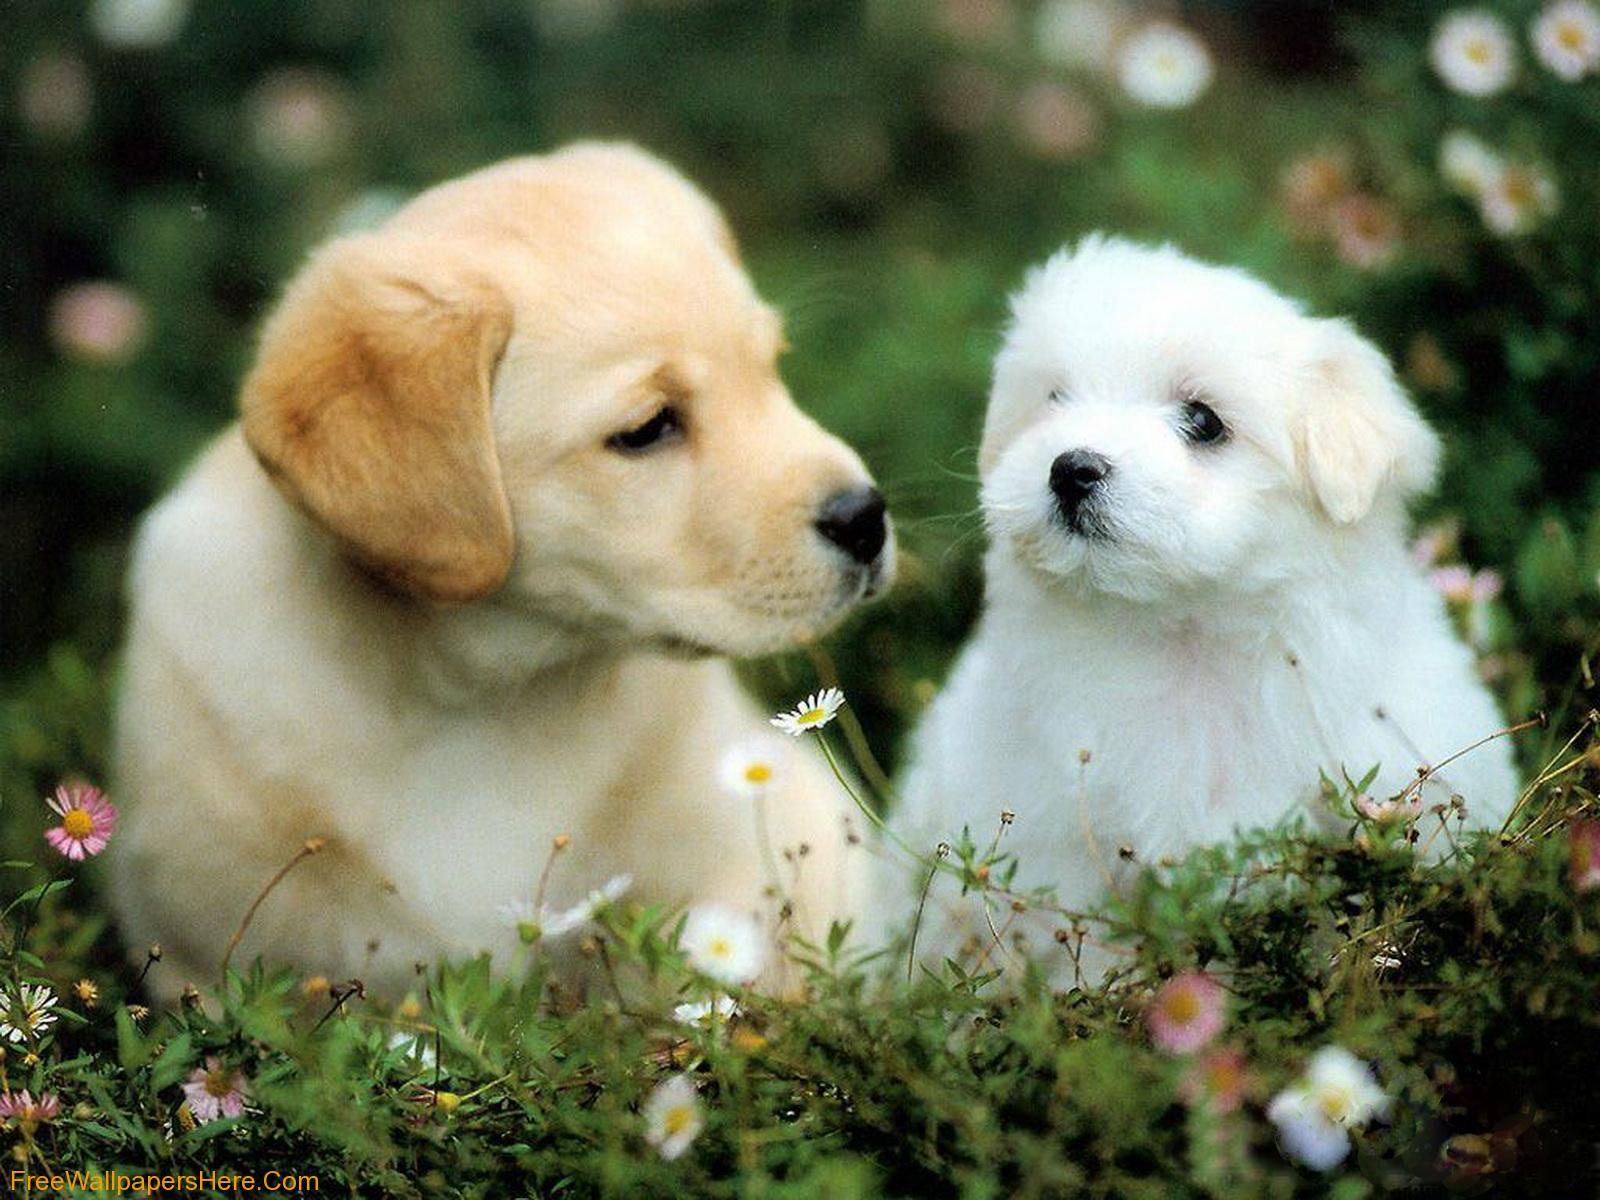 Wallpaper Gallery Cute Puppies Wallpaper 1600x1200